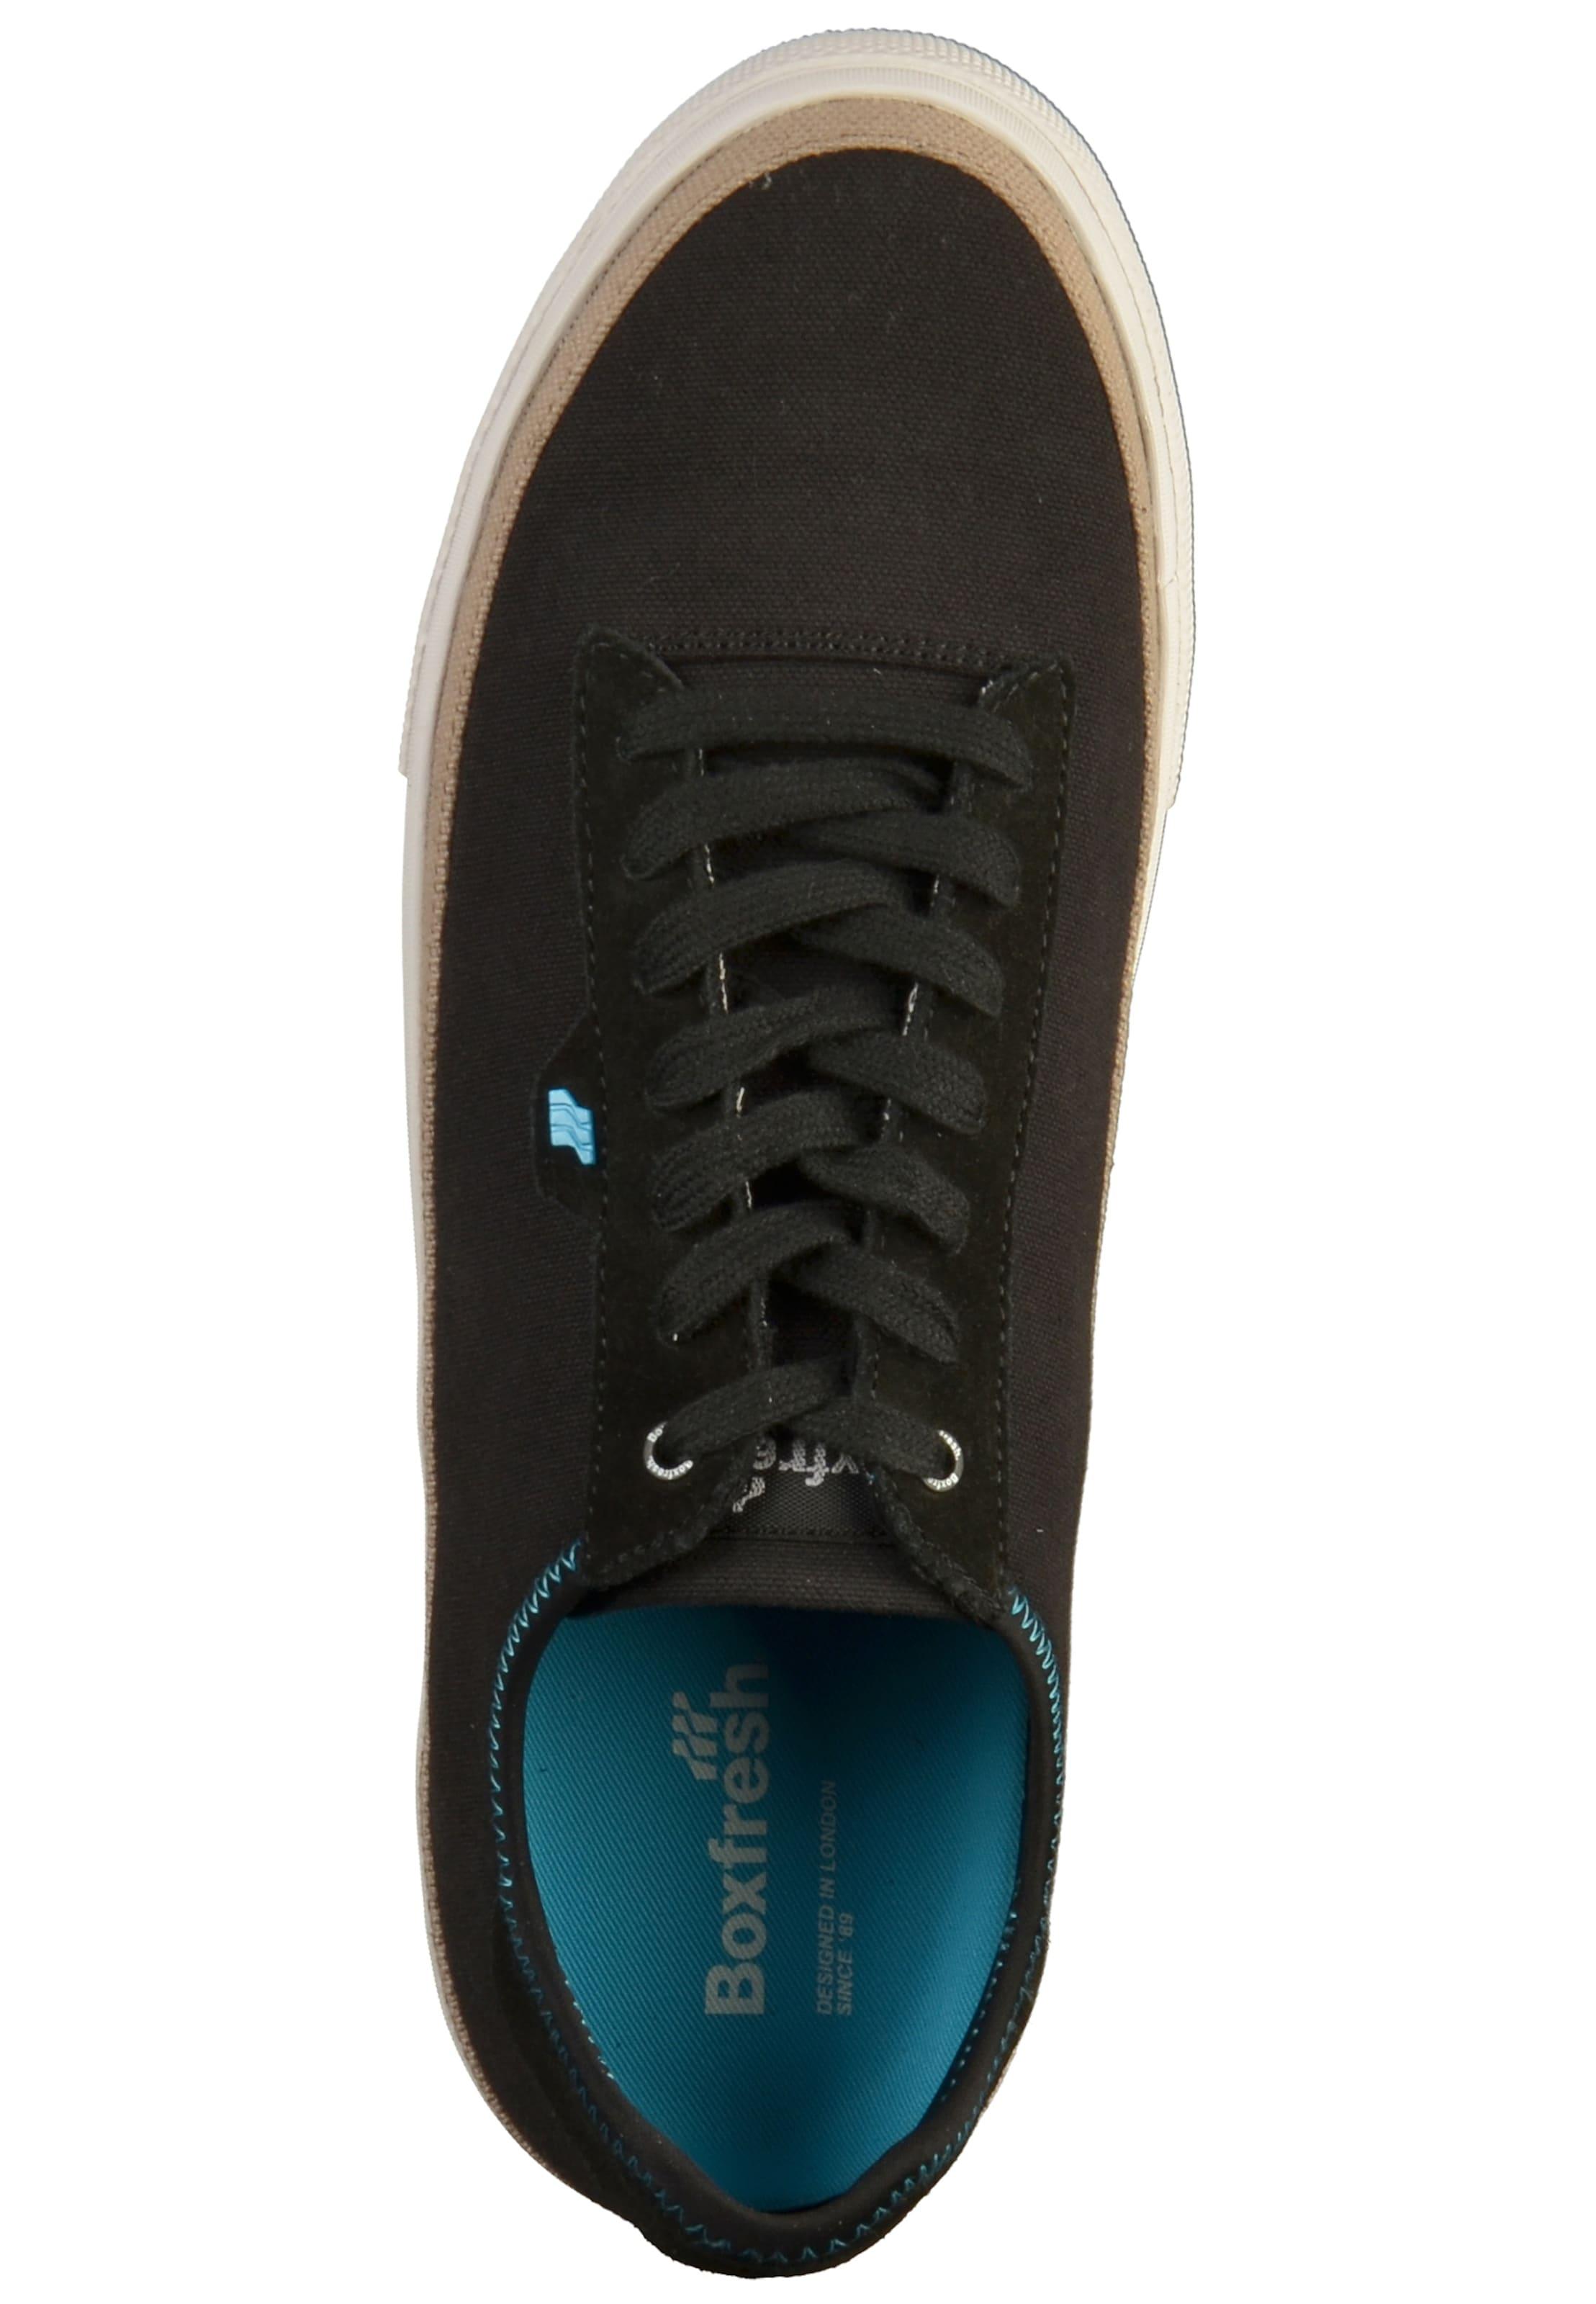 Sneaker Boxfresh 'cordvic' Boxfresh 'cordvic' In Schwarz Sneaker Sneaker 'cordvic' Boxfresh In Schwarz uZiOPkX